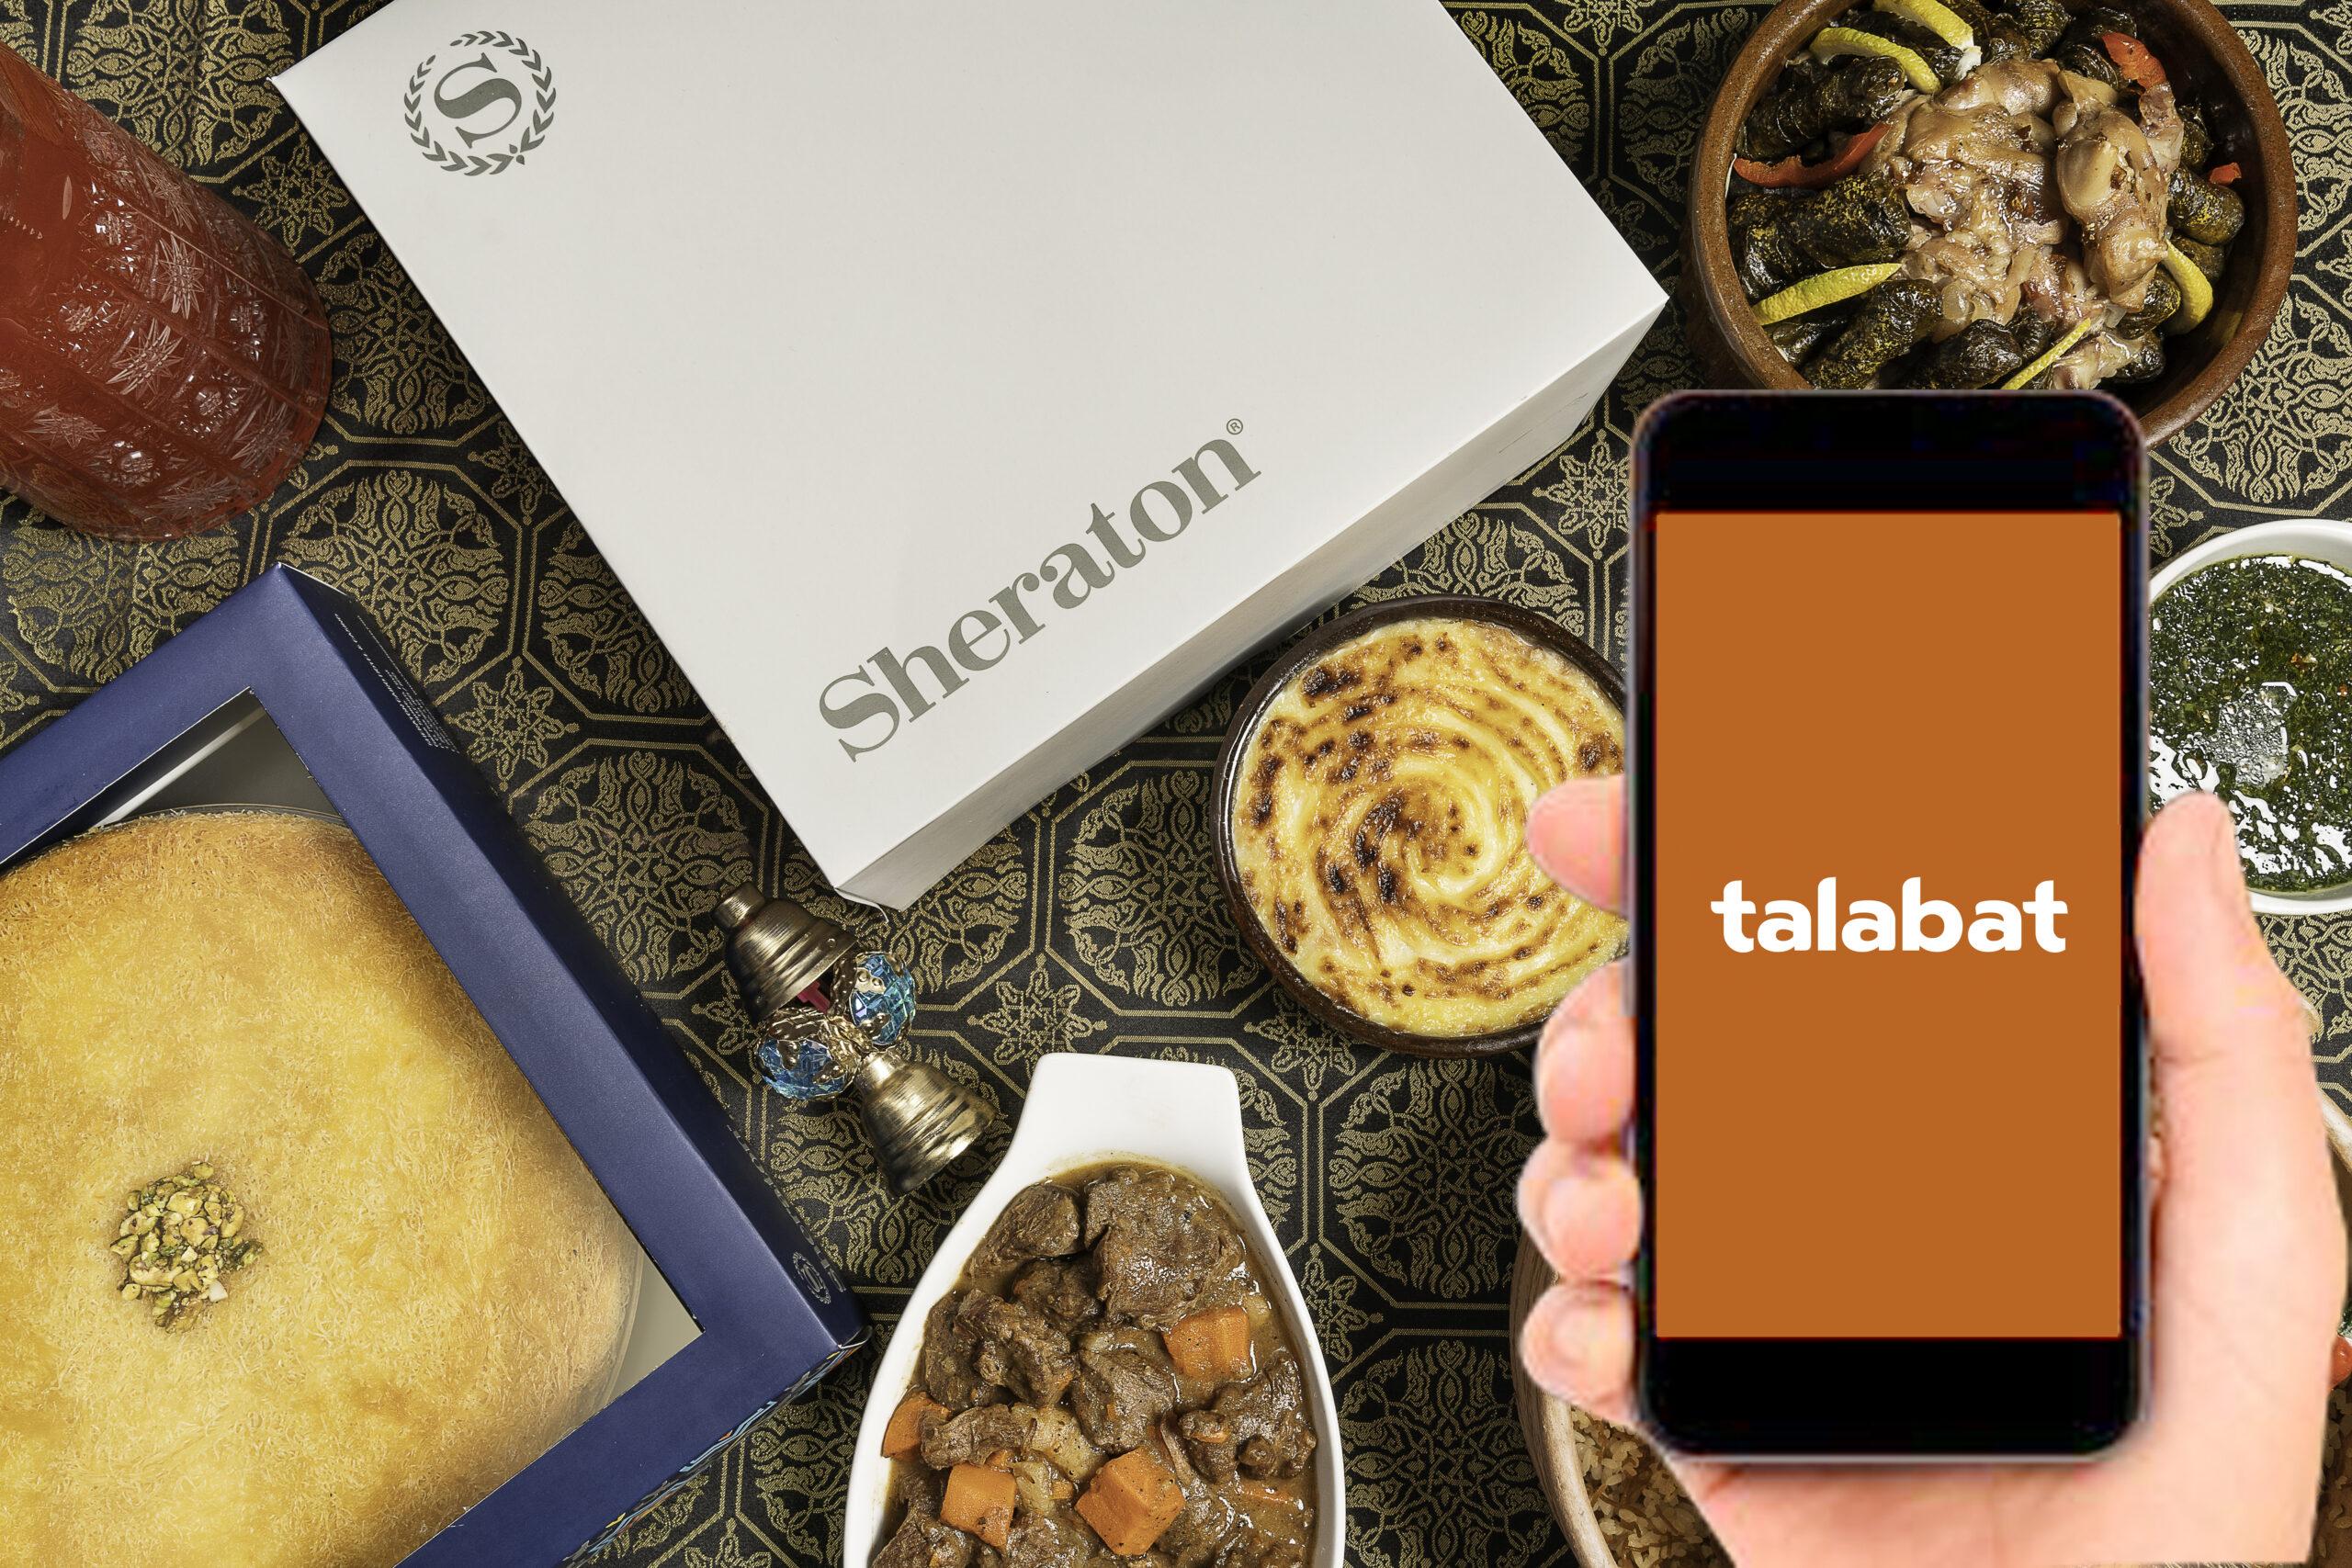 SHC Talabat 1 scaled - فندق وكازينو شيراتون القاهرة يقدم خدمة توصيل الطلبات للمنازل عن طريق تطبيق طلبات